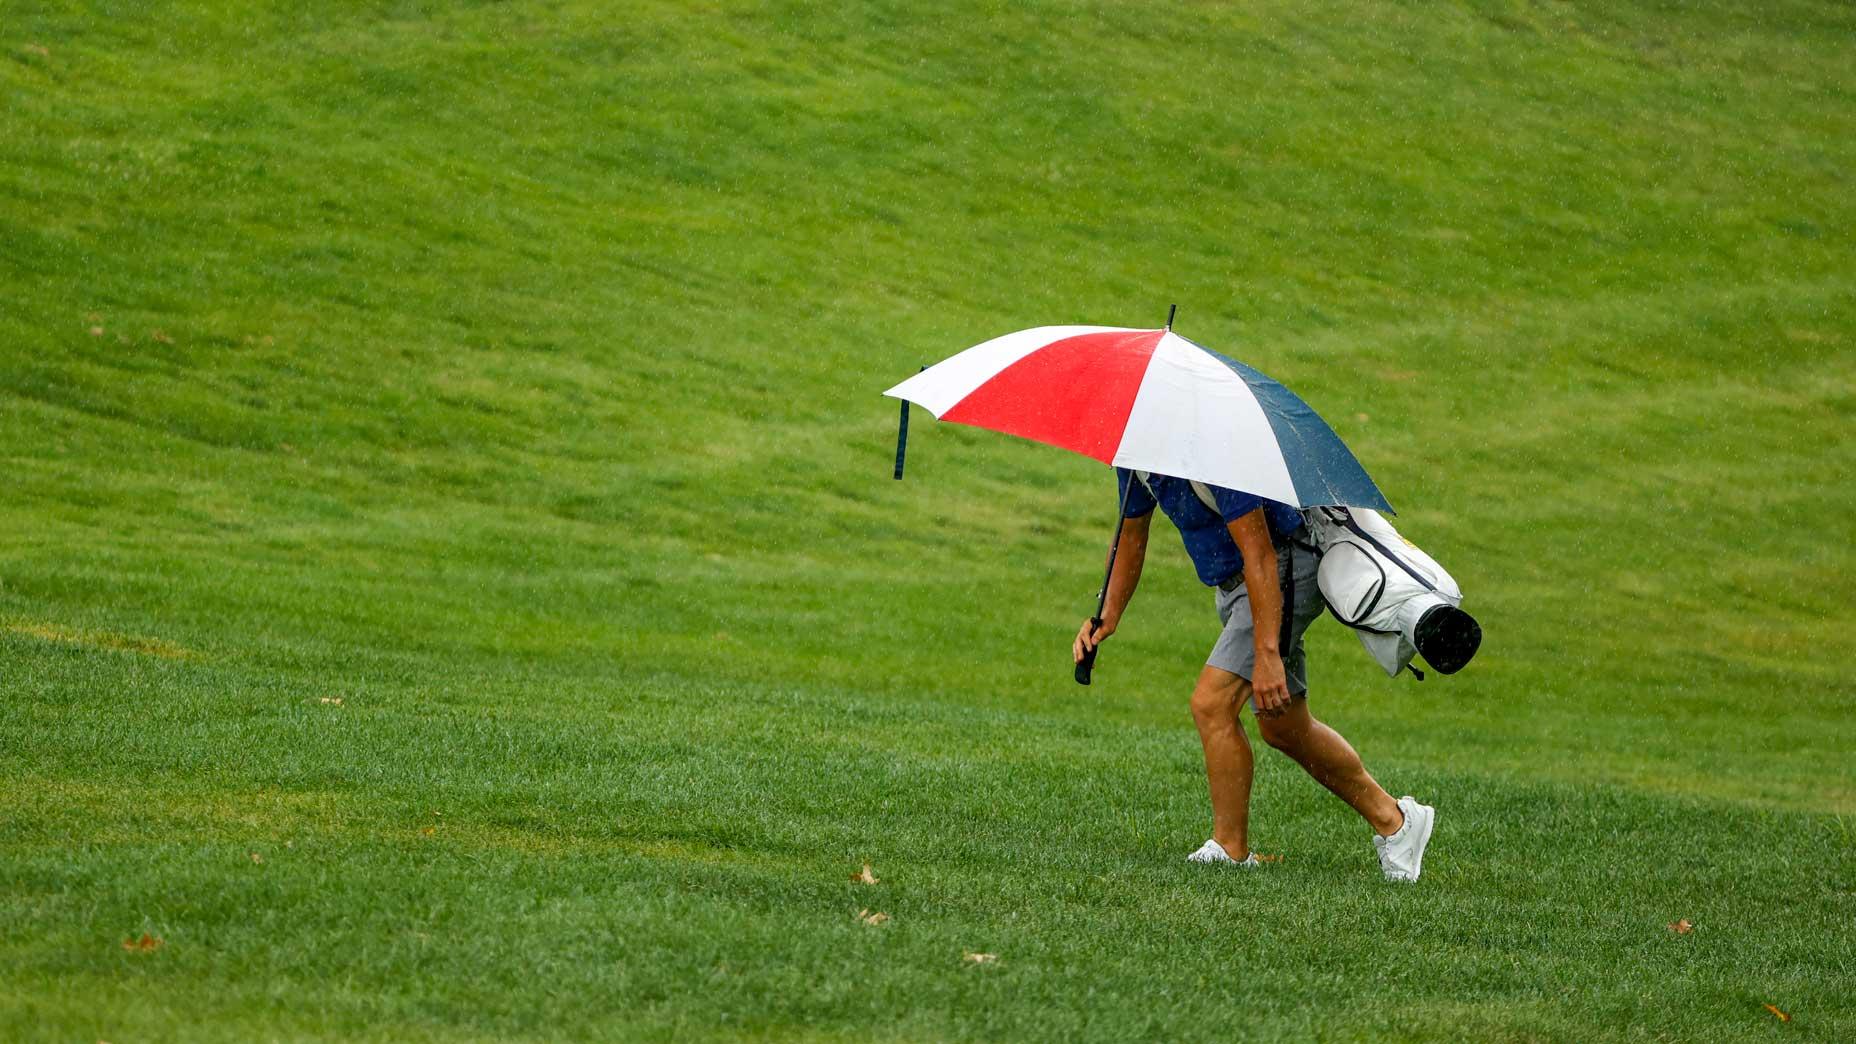 the player hides under an umbrella